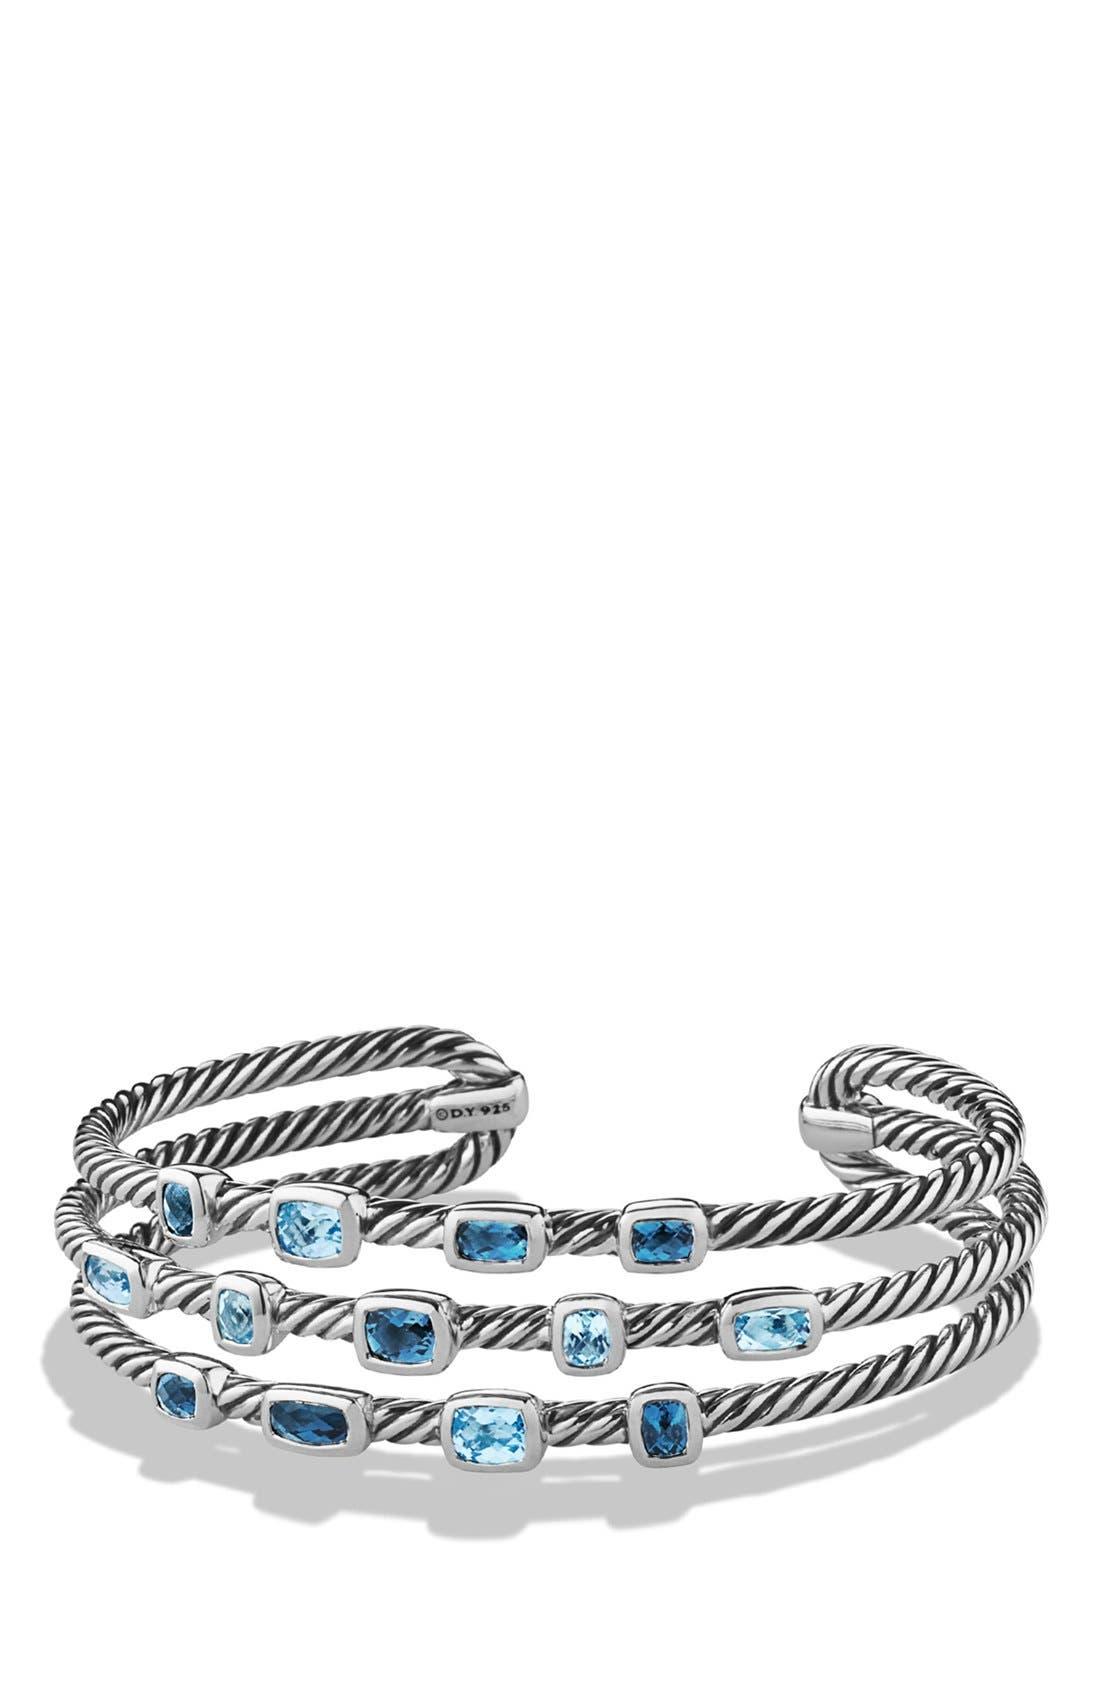 Main Image - David Yurman 'Confetti' Narrow Cuff Bracelet with Blue Topaz and Hampton Blue Topaz